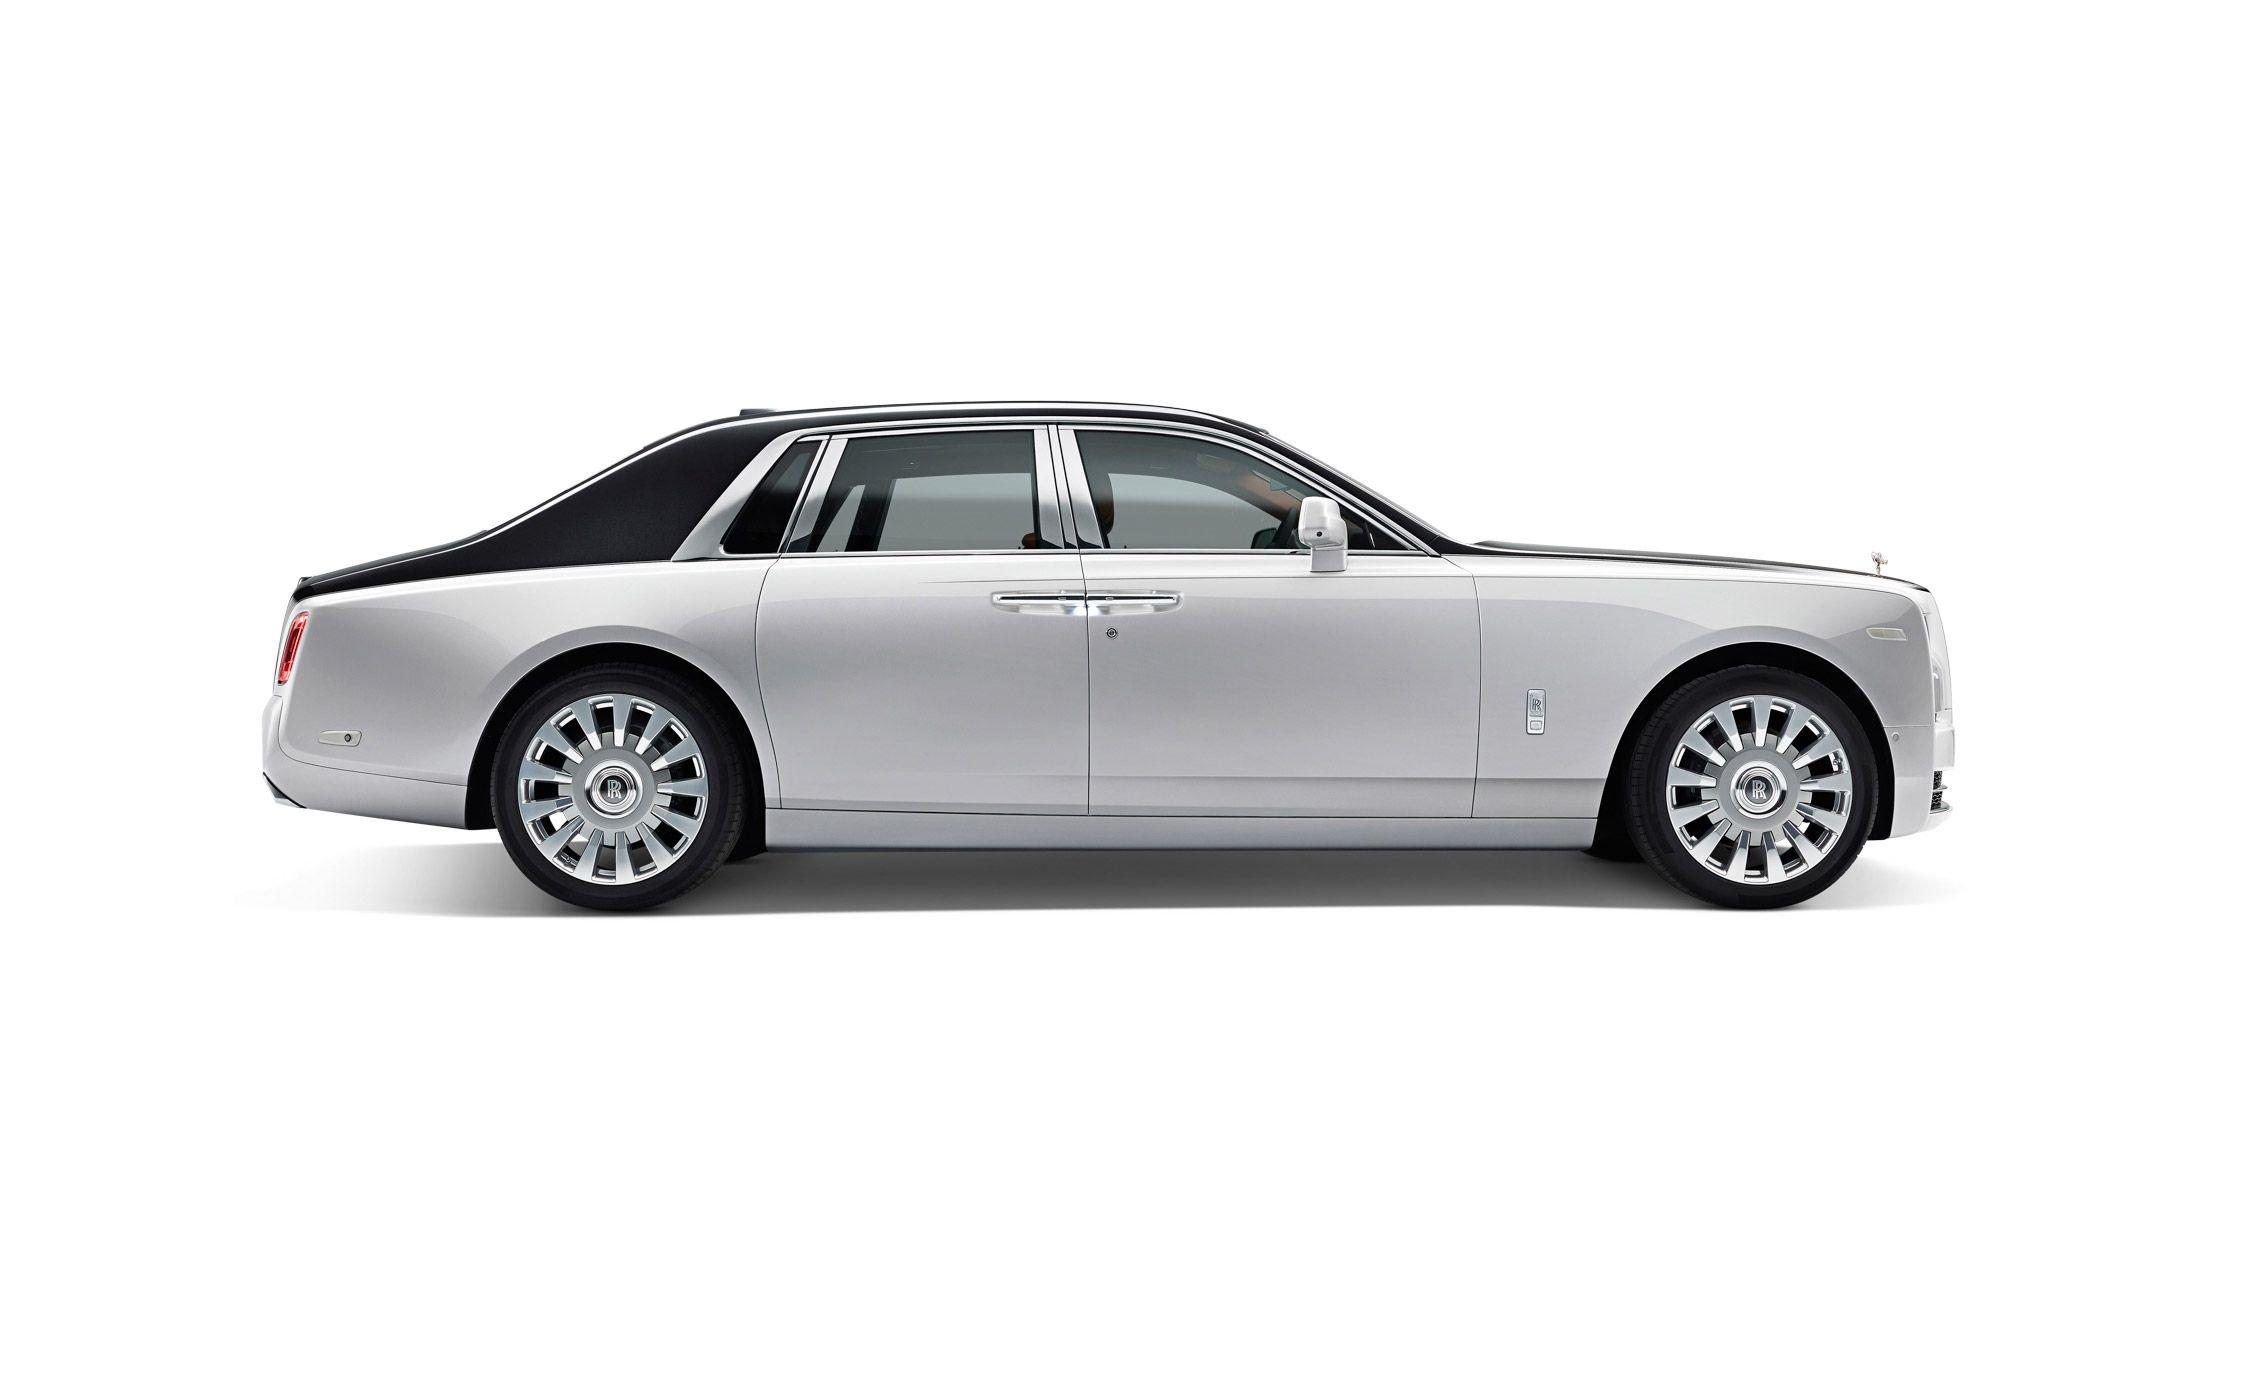 2018 Rolls-Royce Phantom VIII Dissected: Interior, Design, Powertrain, and More!